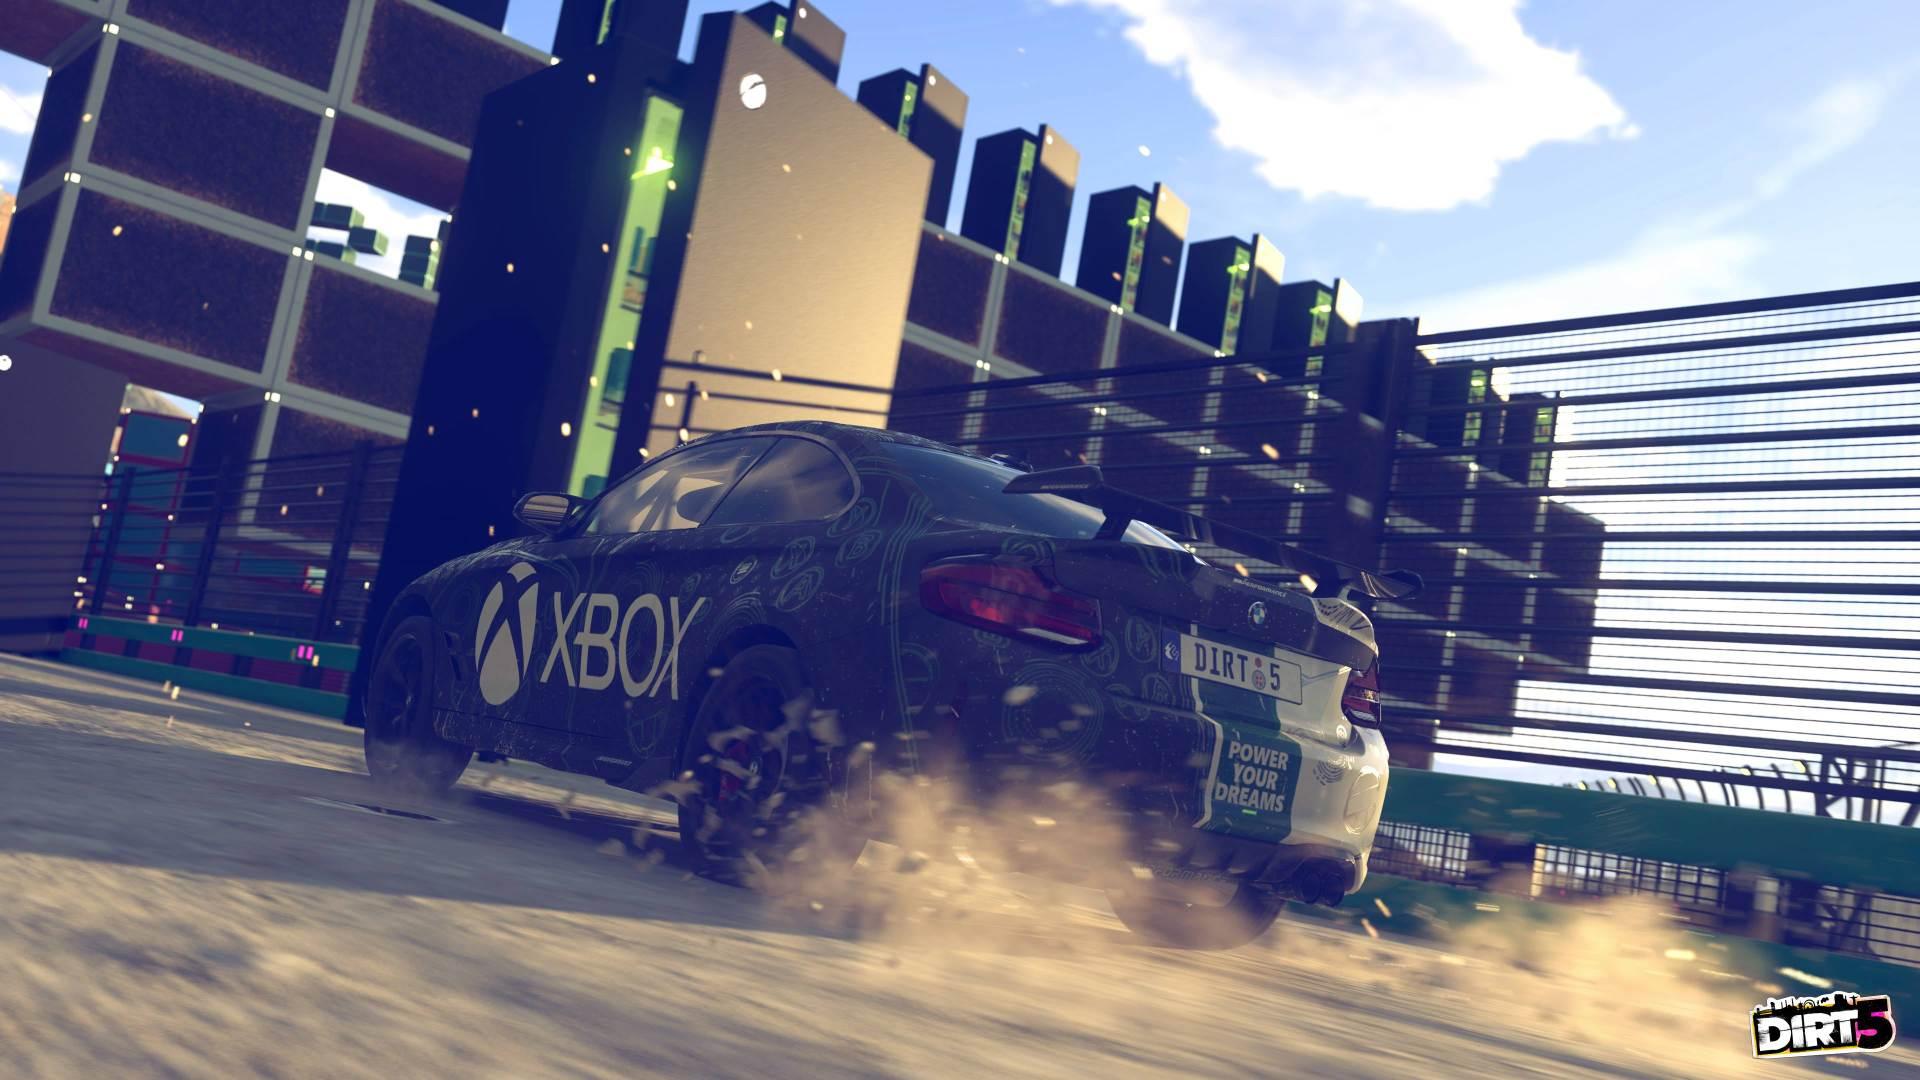 Dirt 5 adds the Xbox Series X fridge as a Game Pass perk screenshot